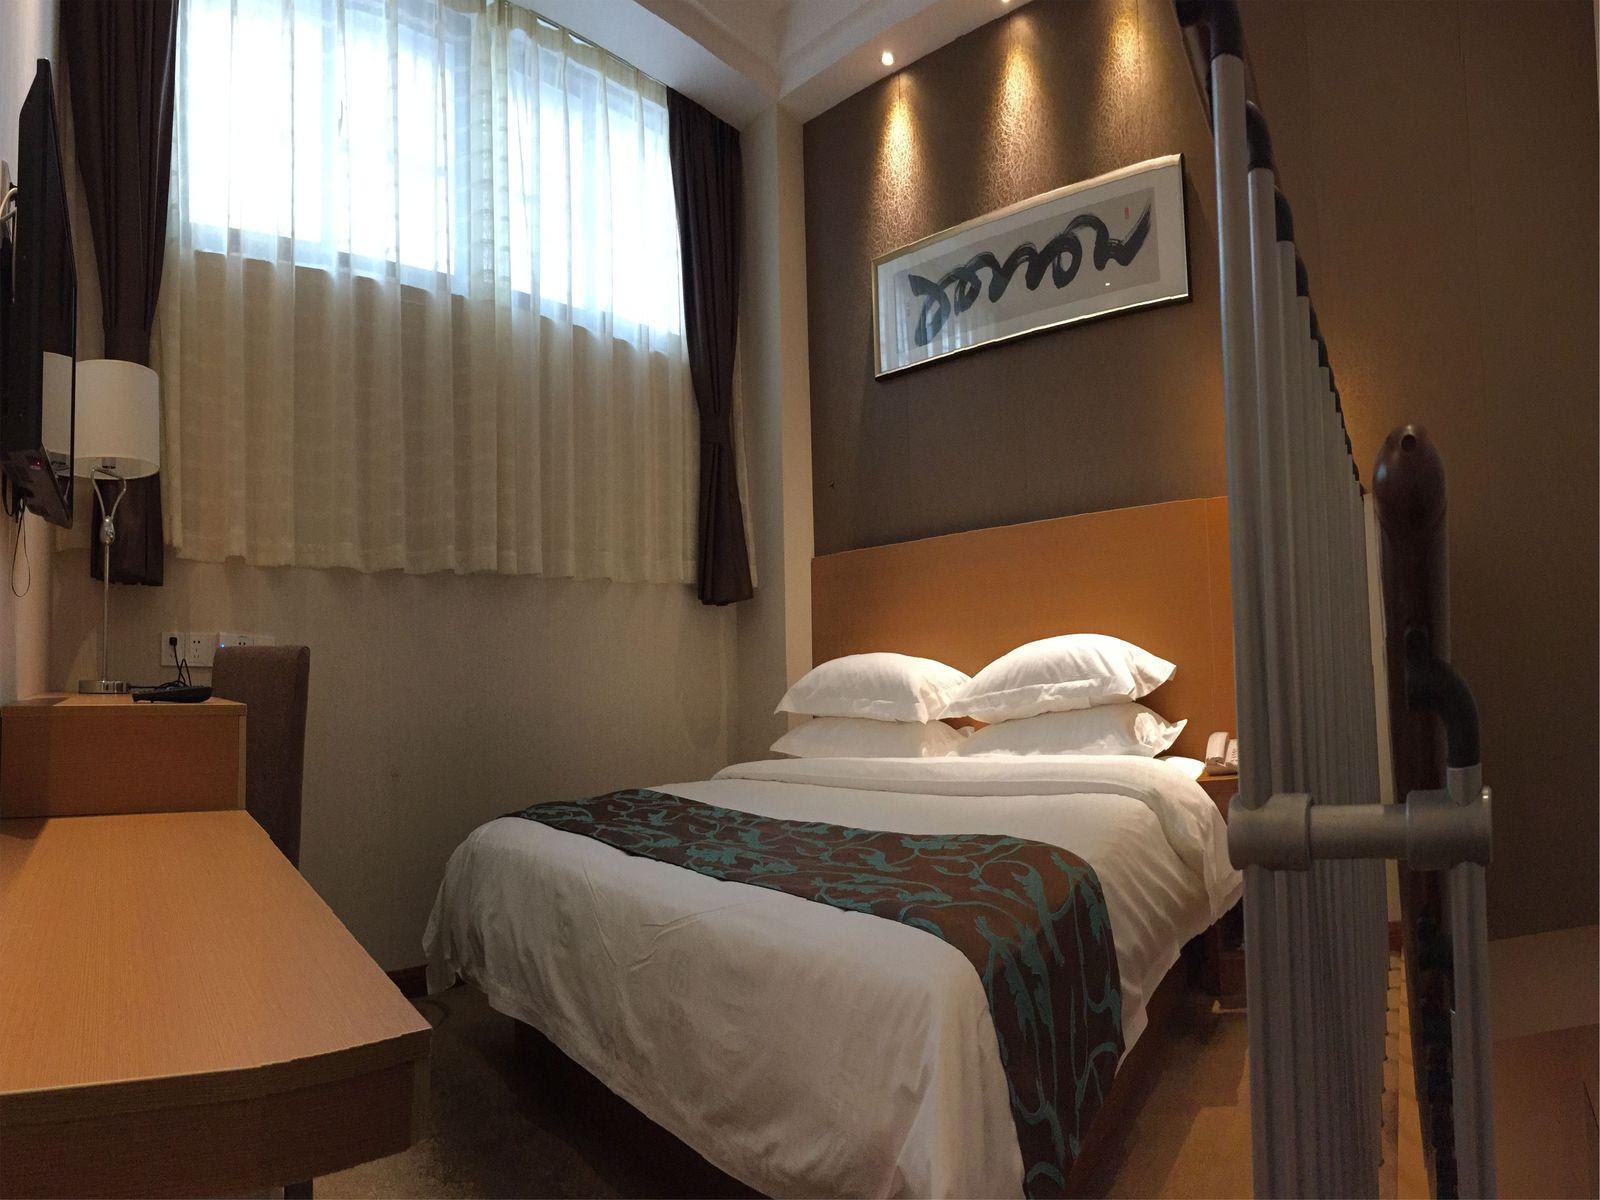 Price Shanghai Hanchao Hotel